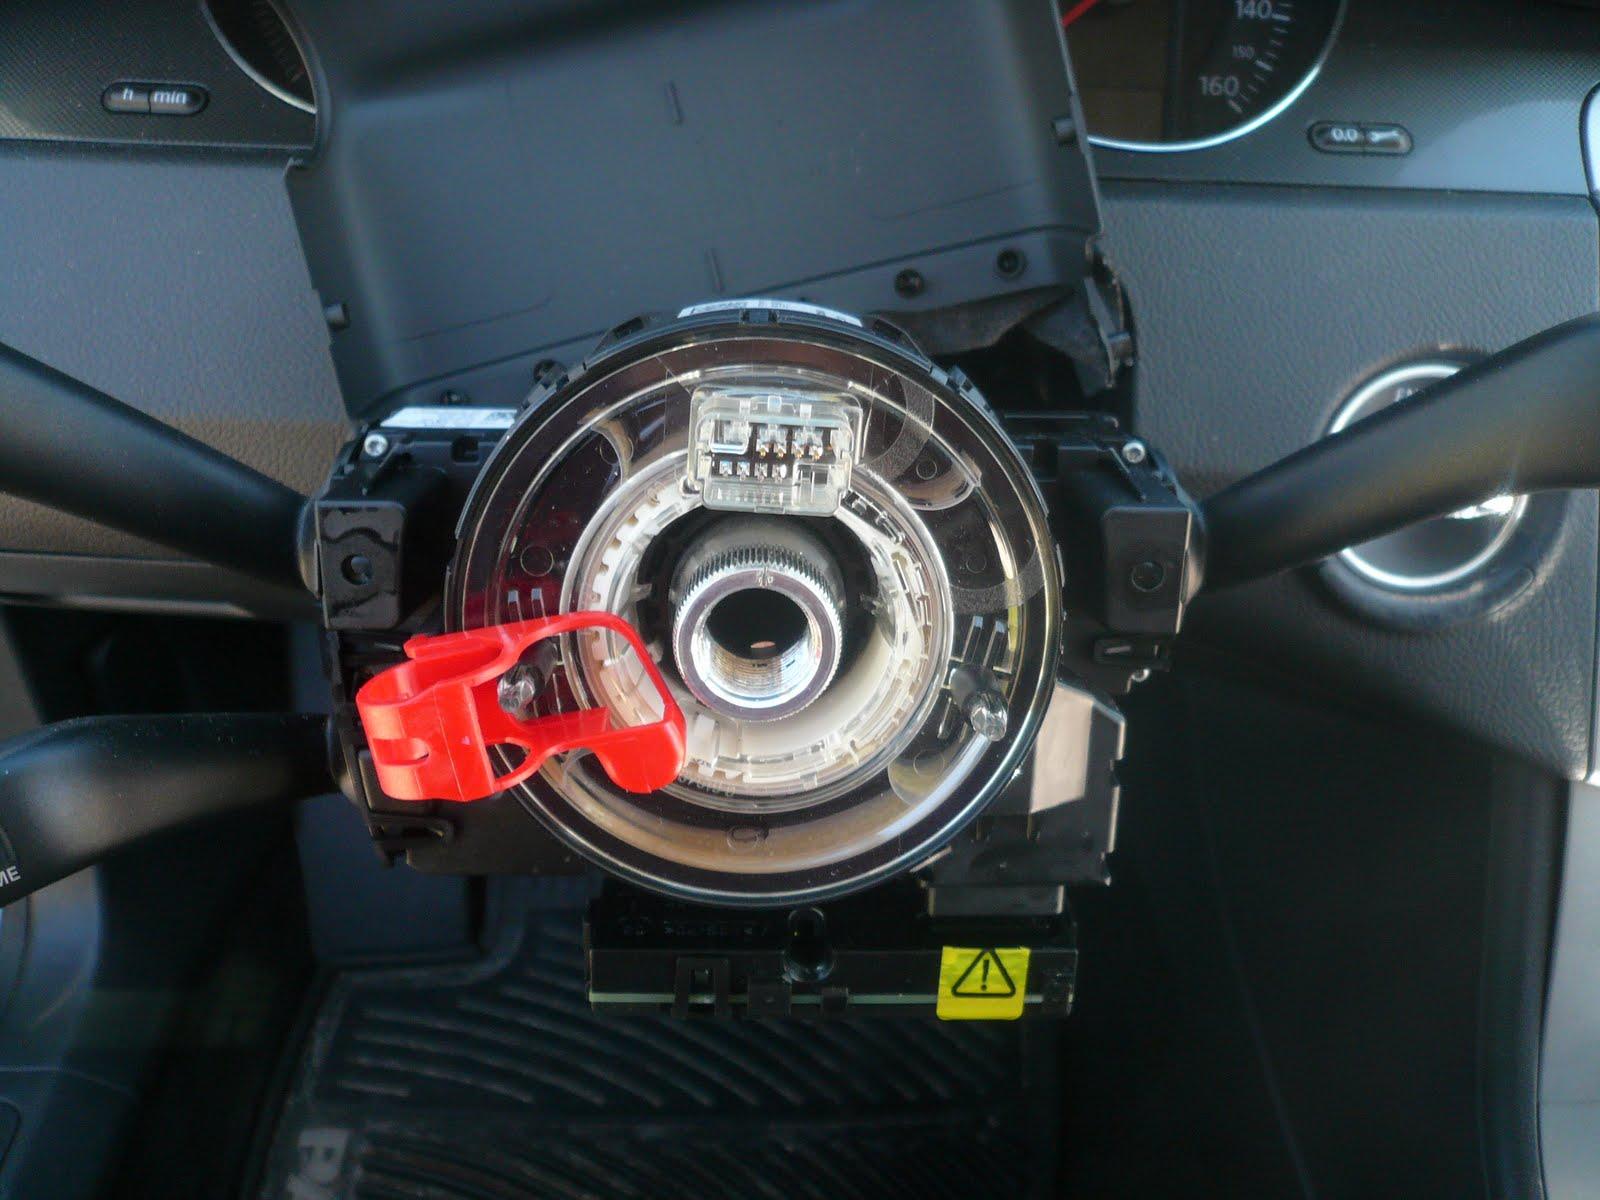 Vw Passat Repair How To Replace The Steering Wheel